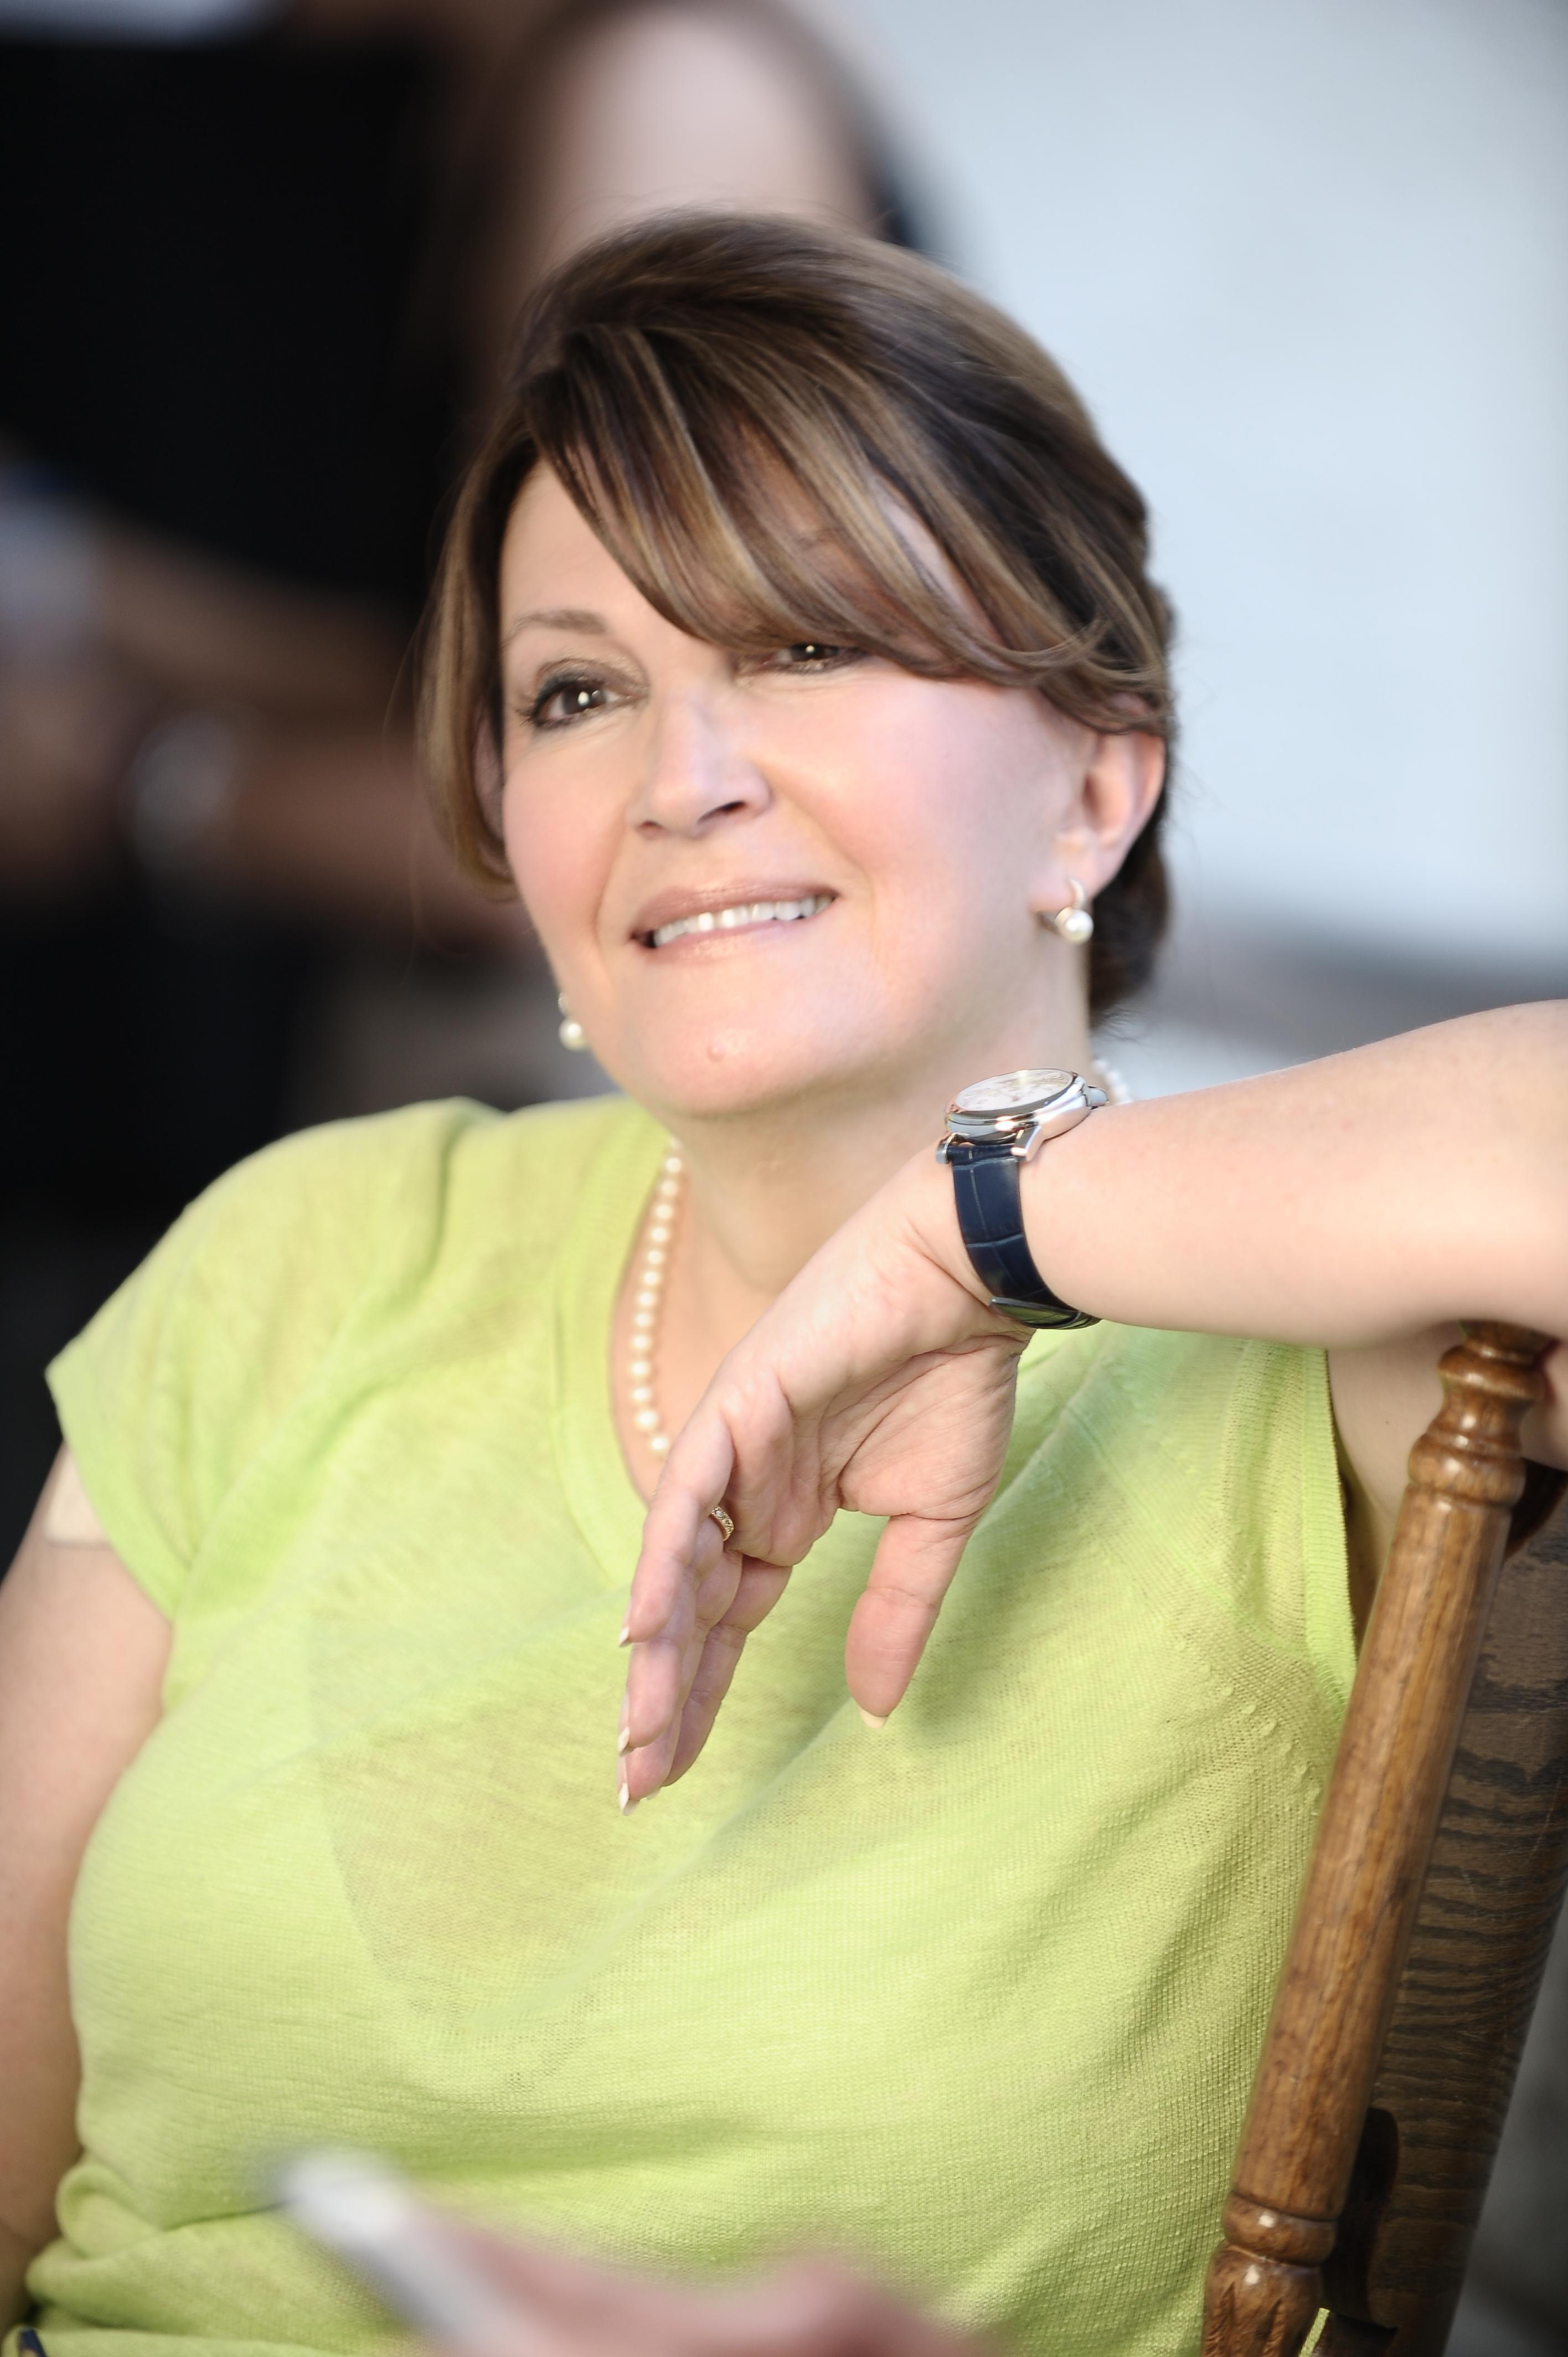 Manuela Arcuri (born 1977) forecast